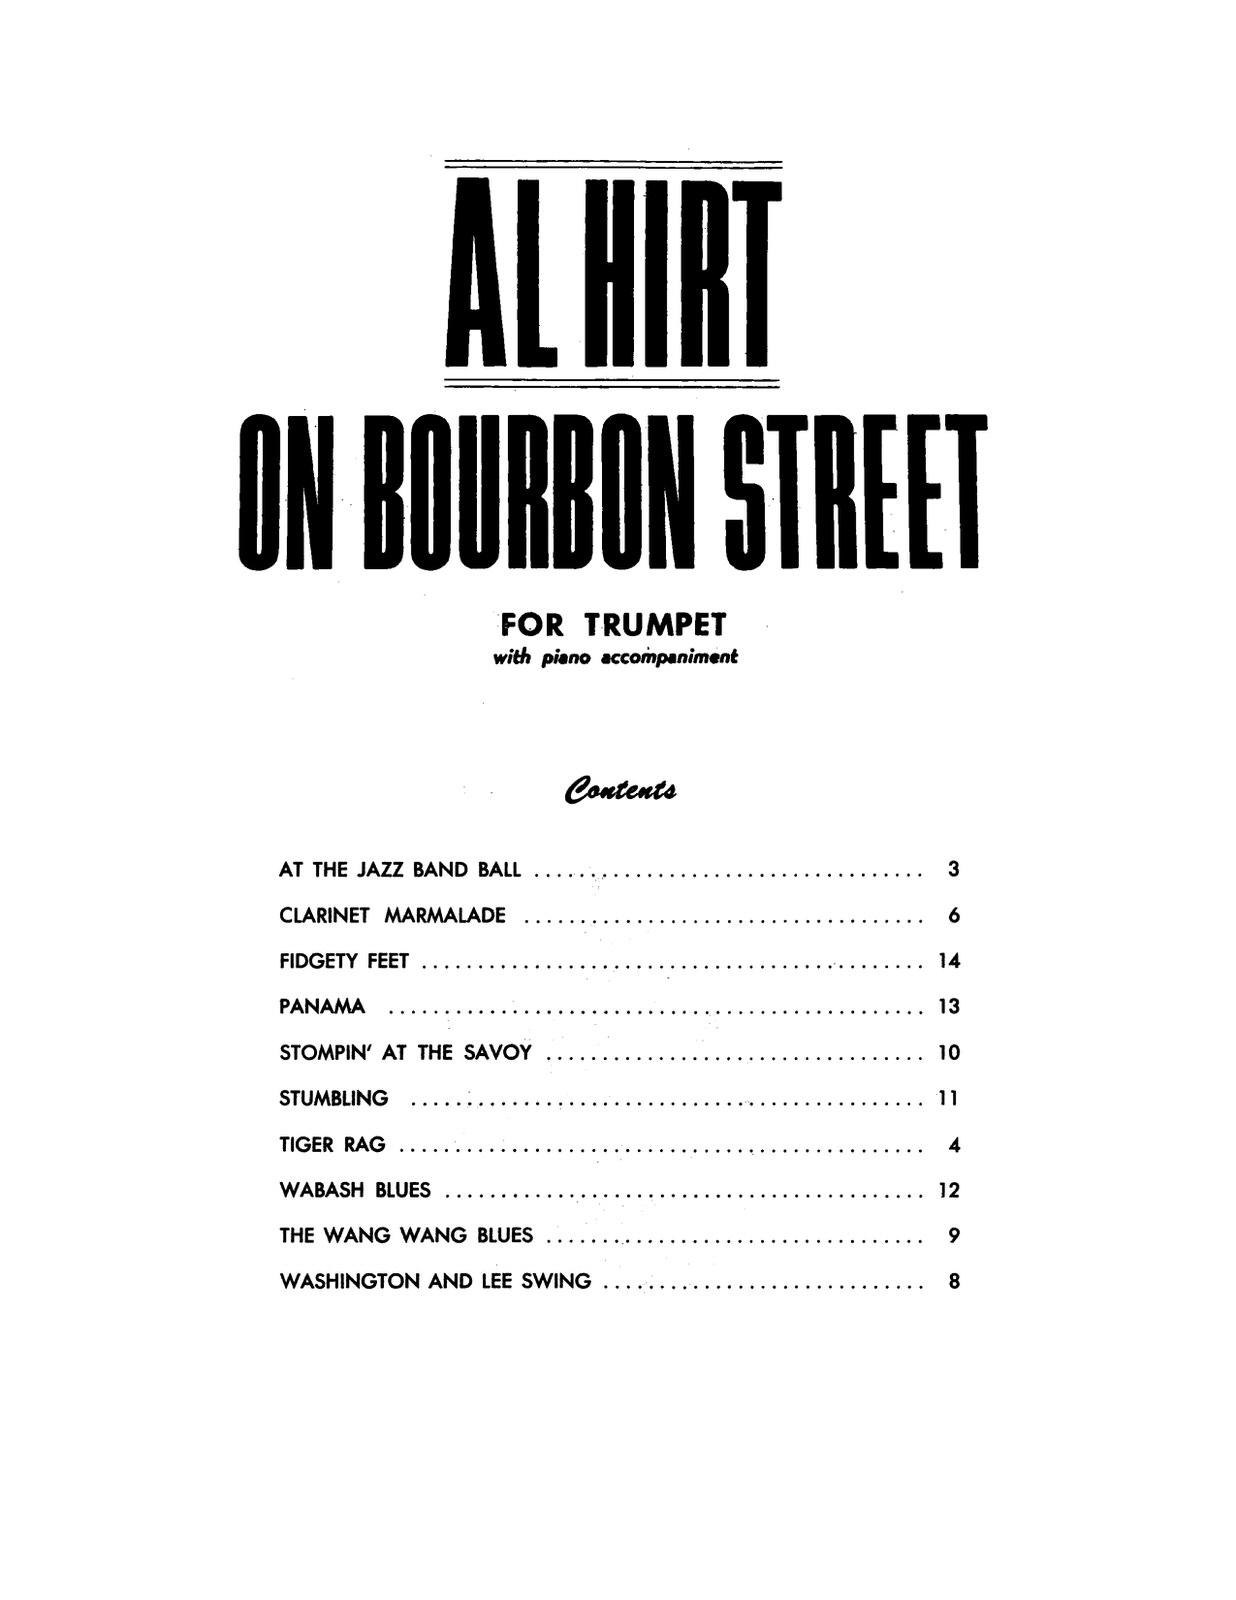 Hirt, On Bourbon Street (Part and Score)-p03